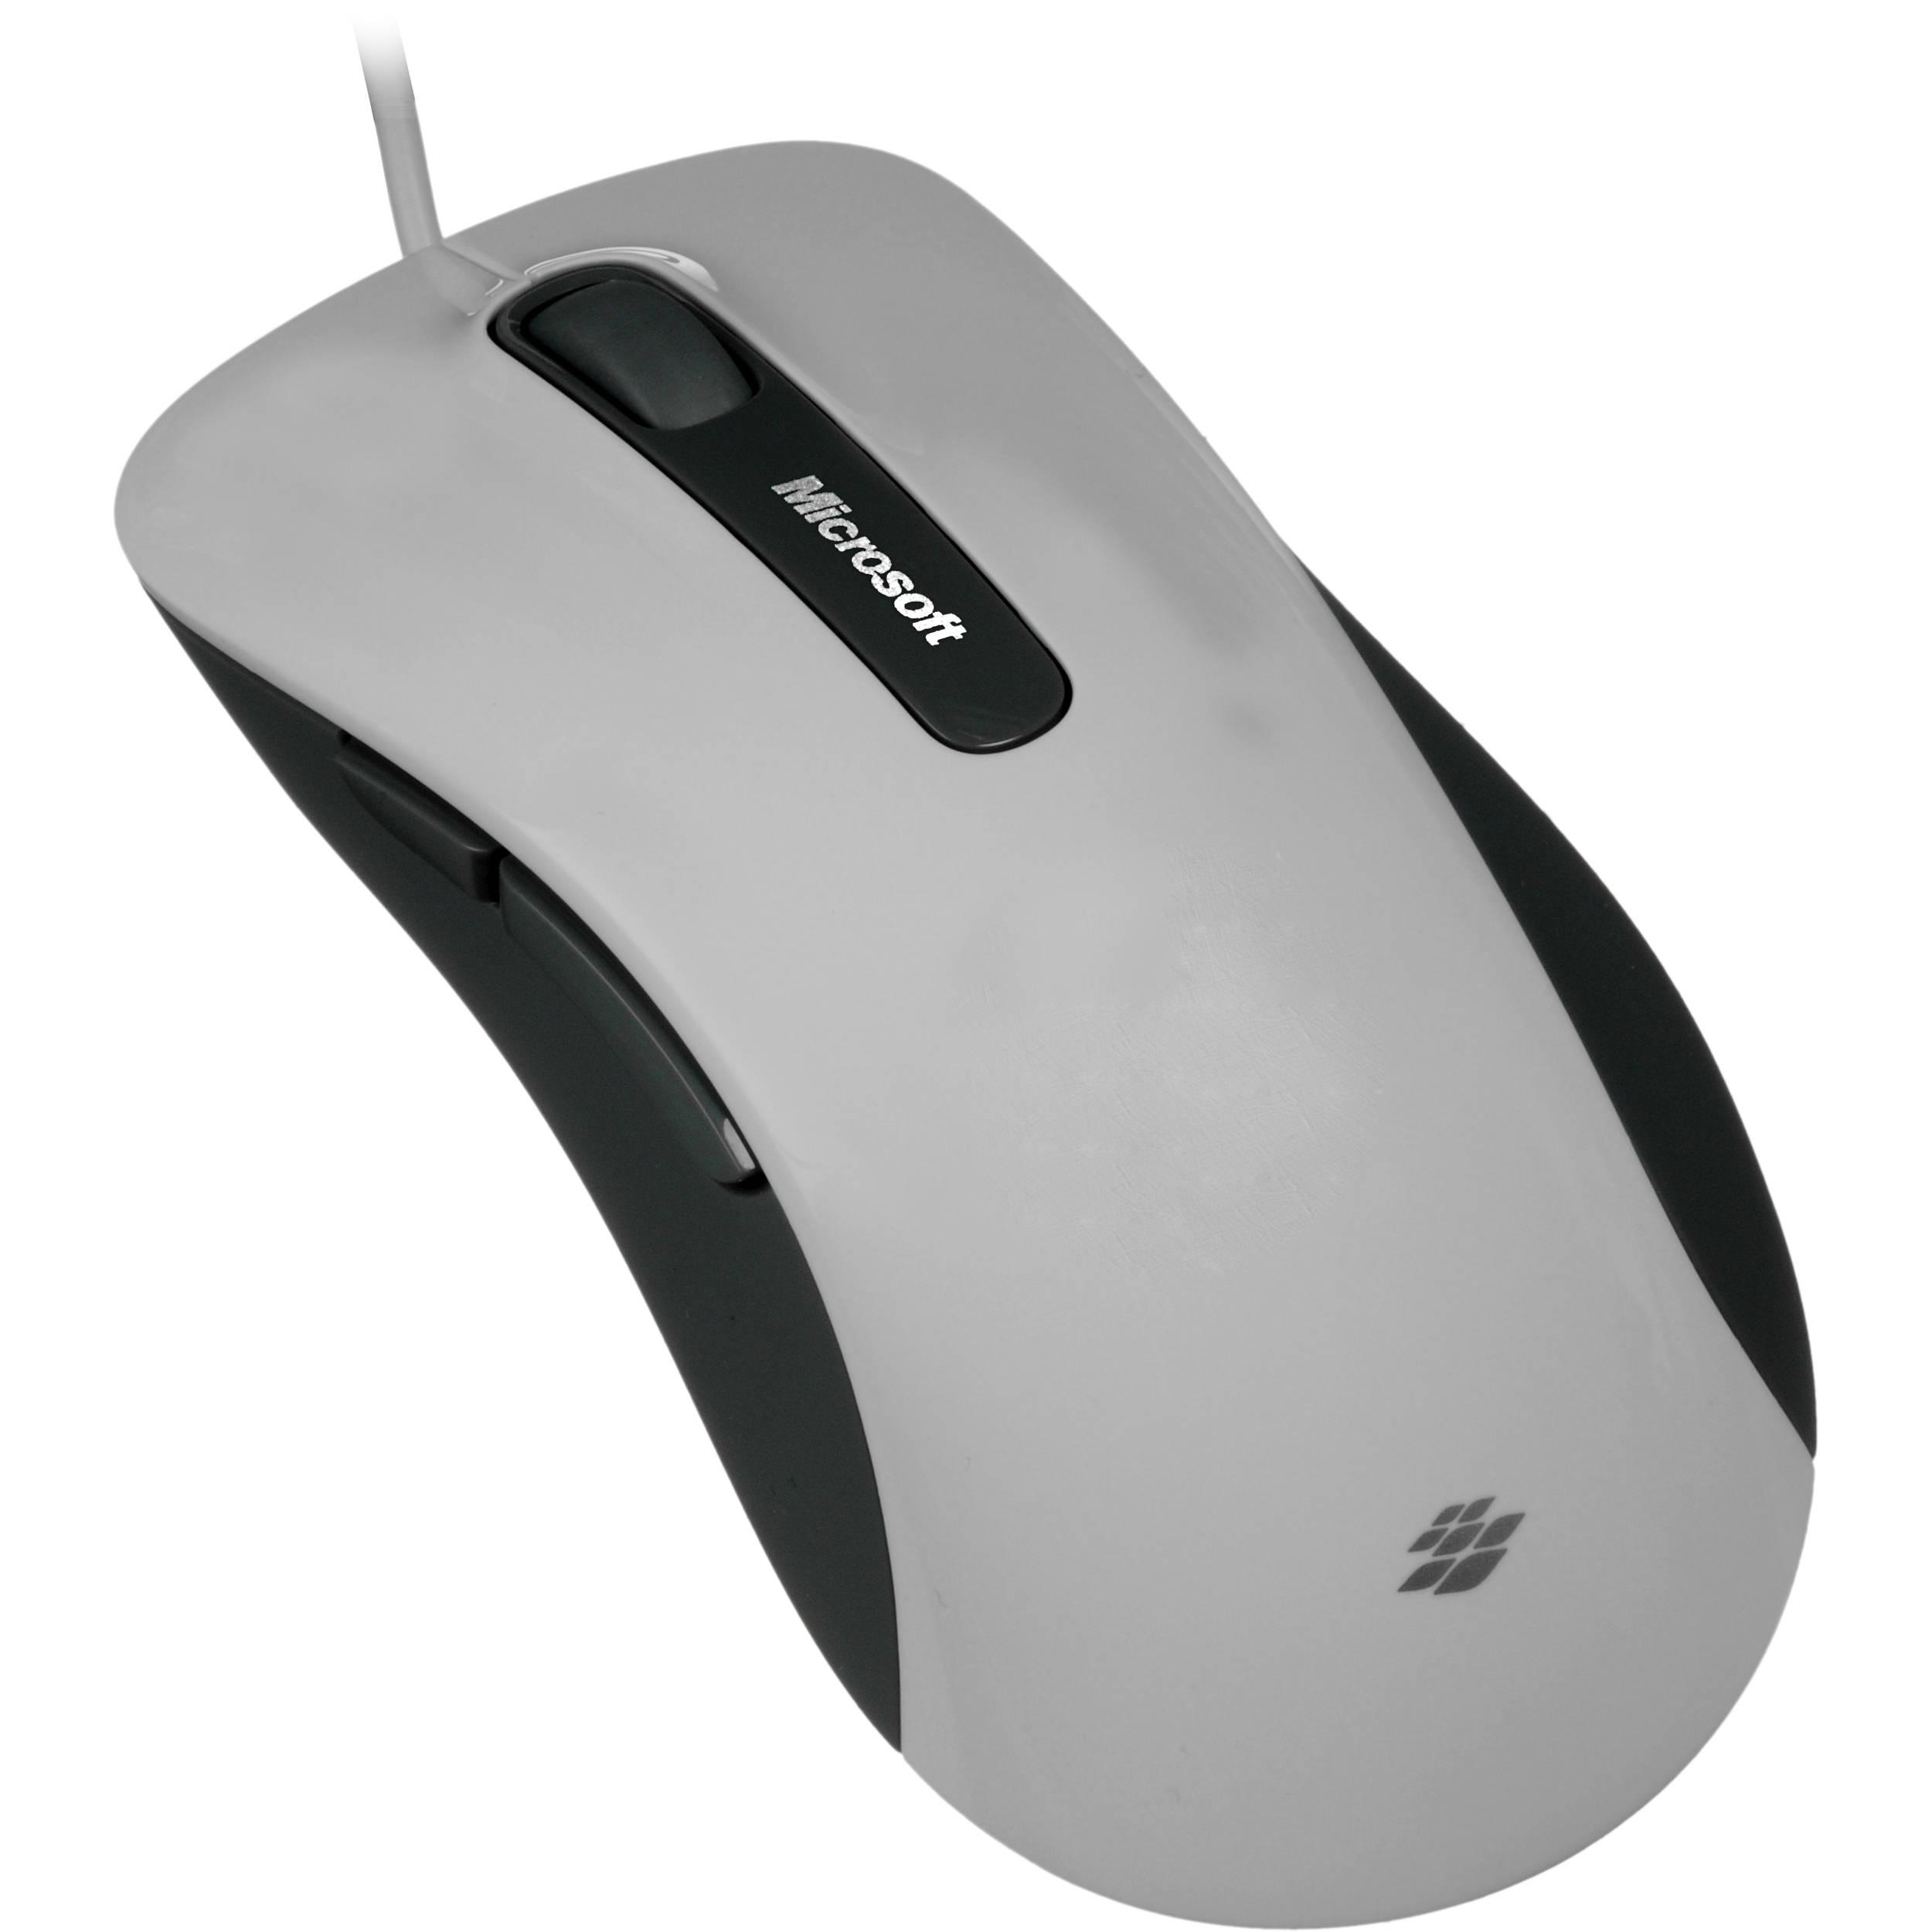 Microsoft Comfort Mouse 6000 S7J-00001 Black Mouse-Newegg.com